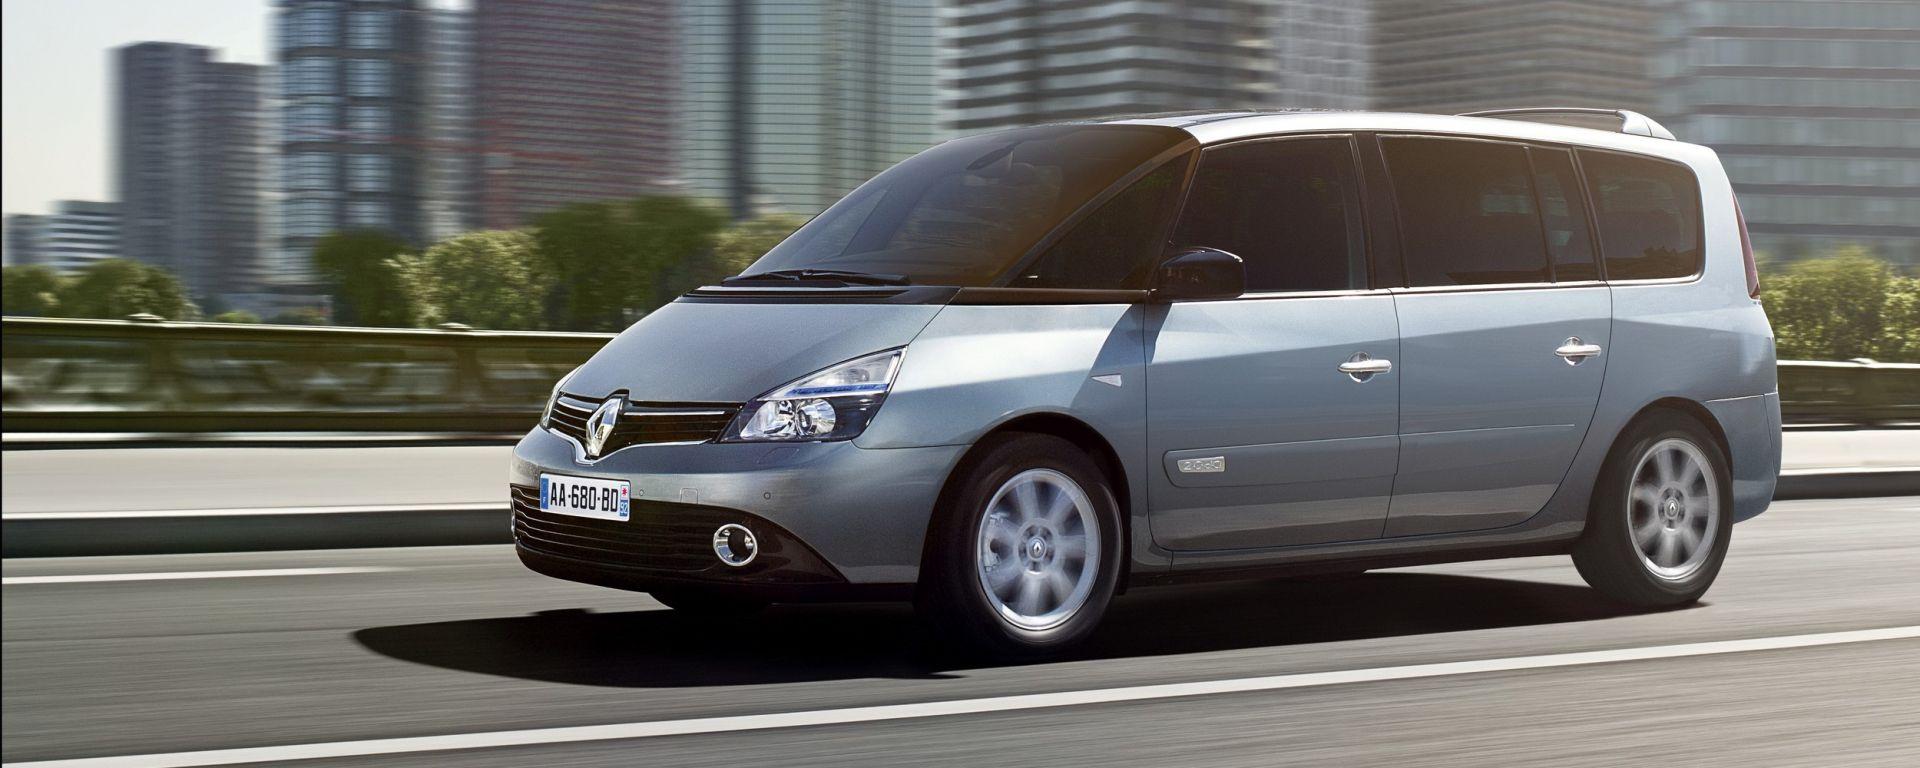 Renault Espace 2013